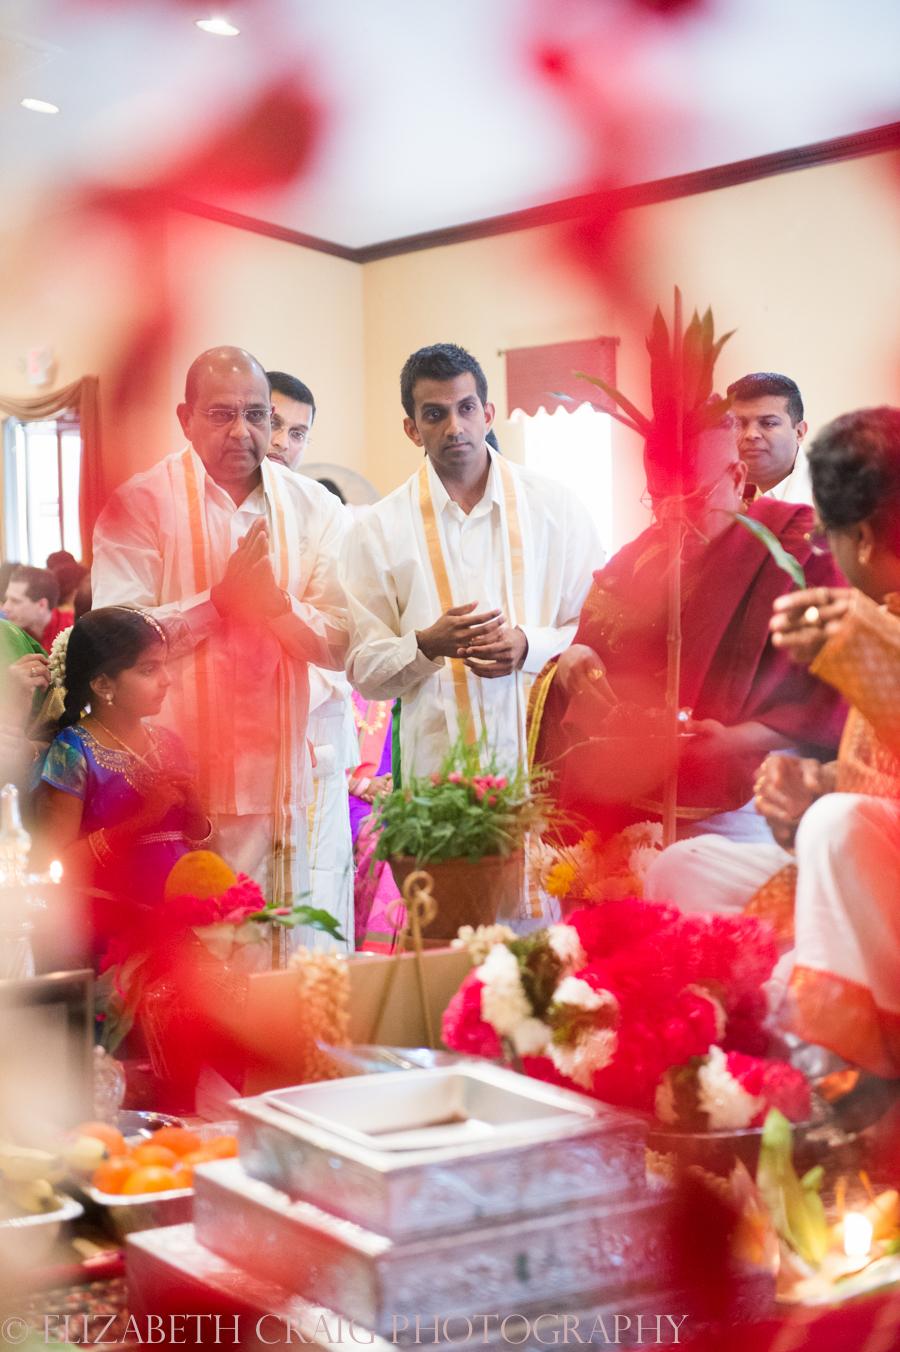 Monroeville Jain Temple Indian Weddings-11